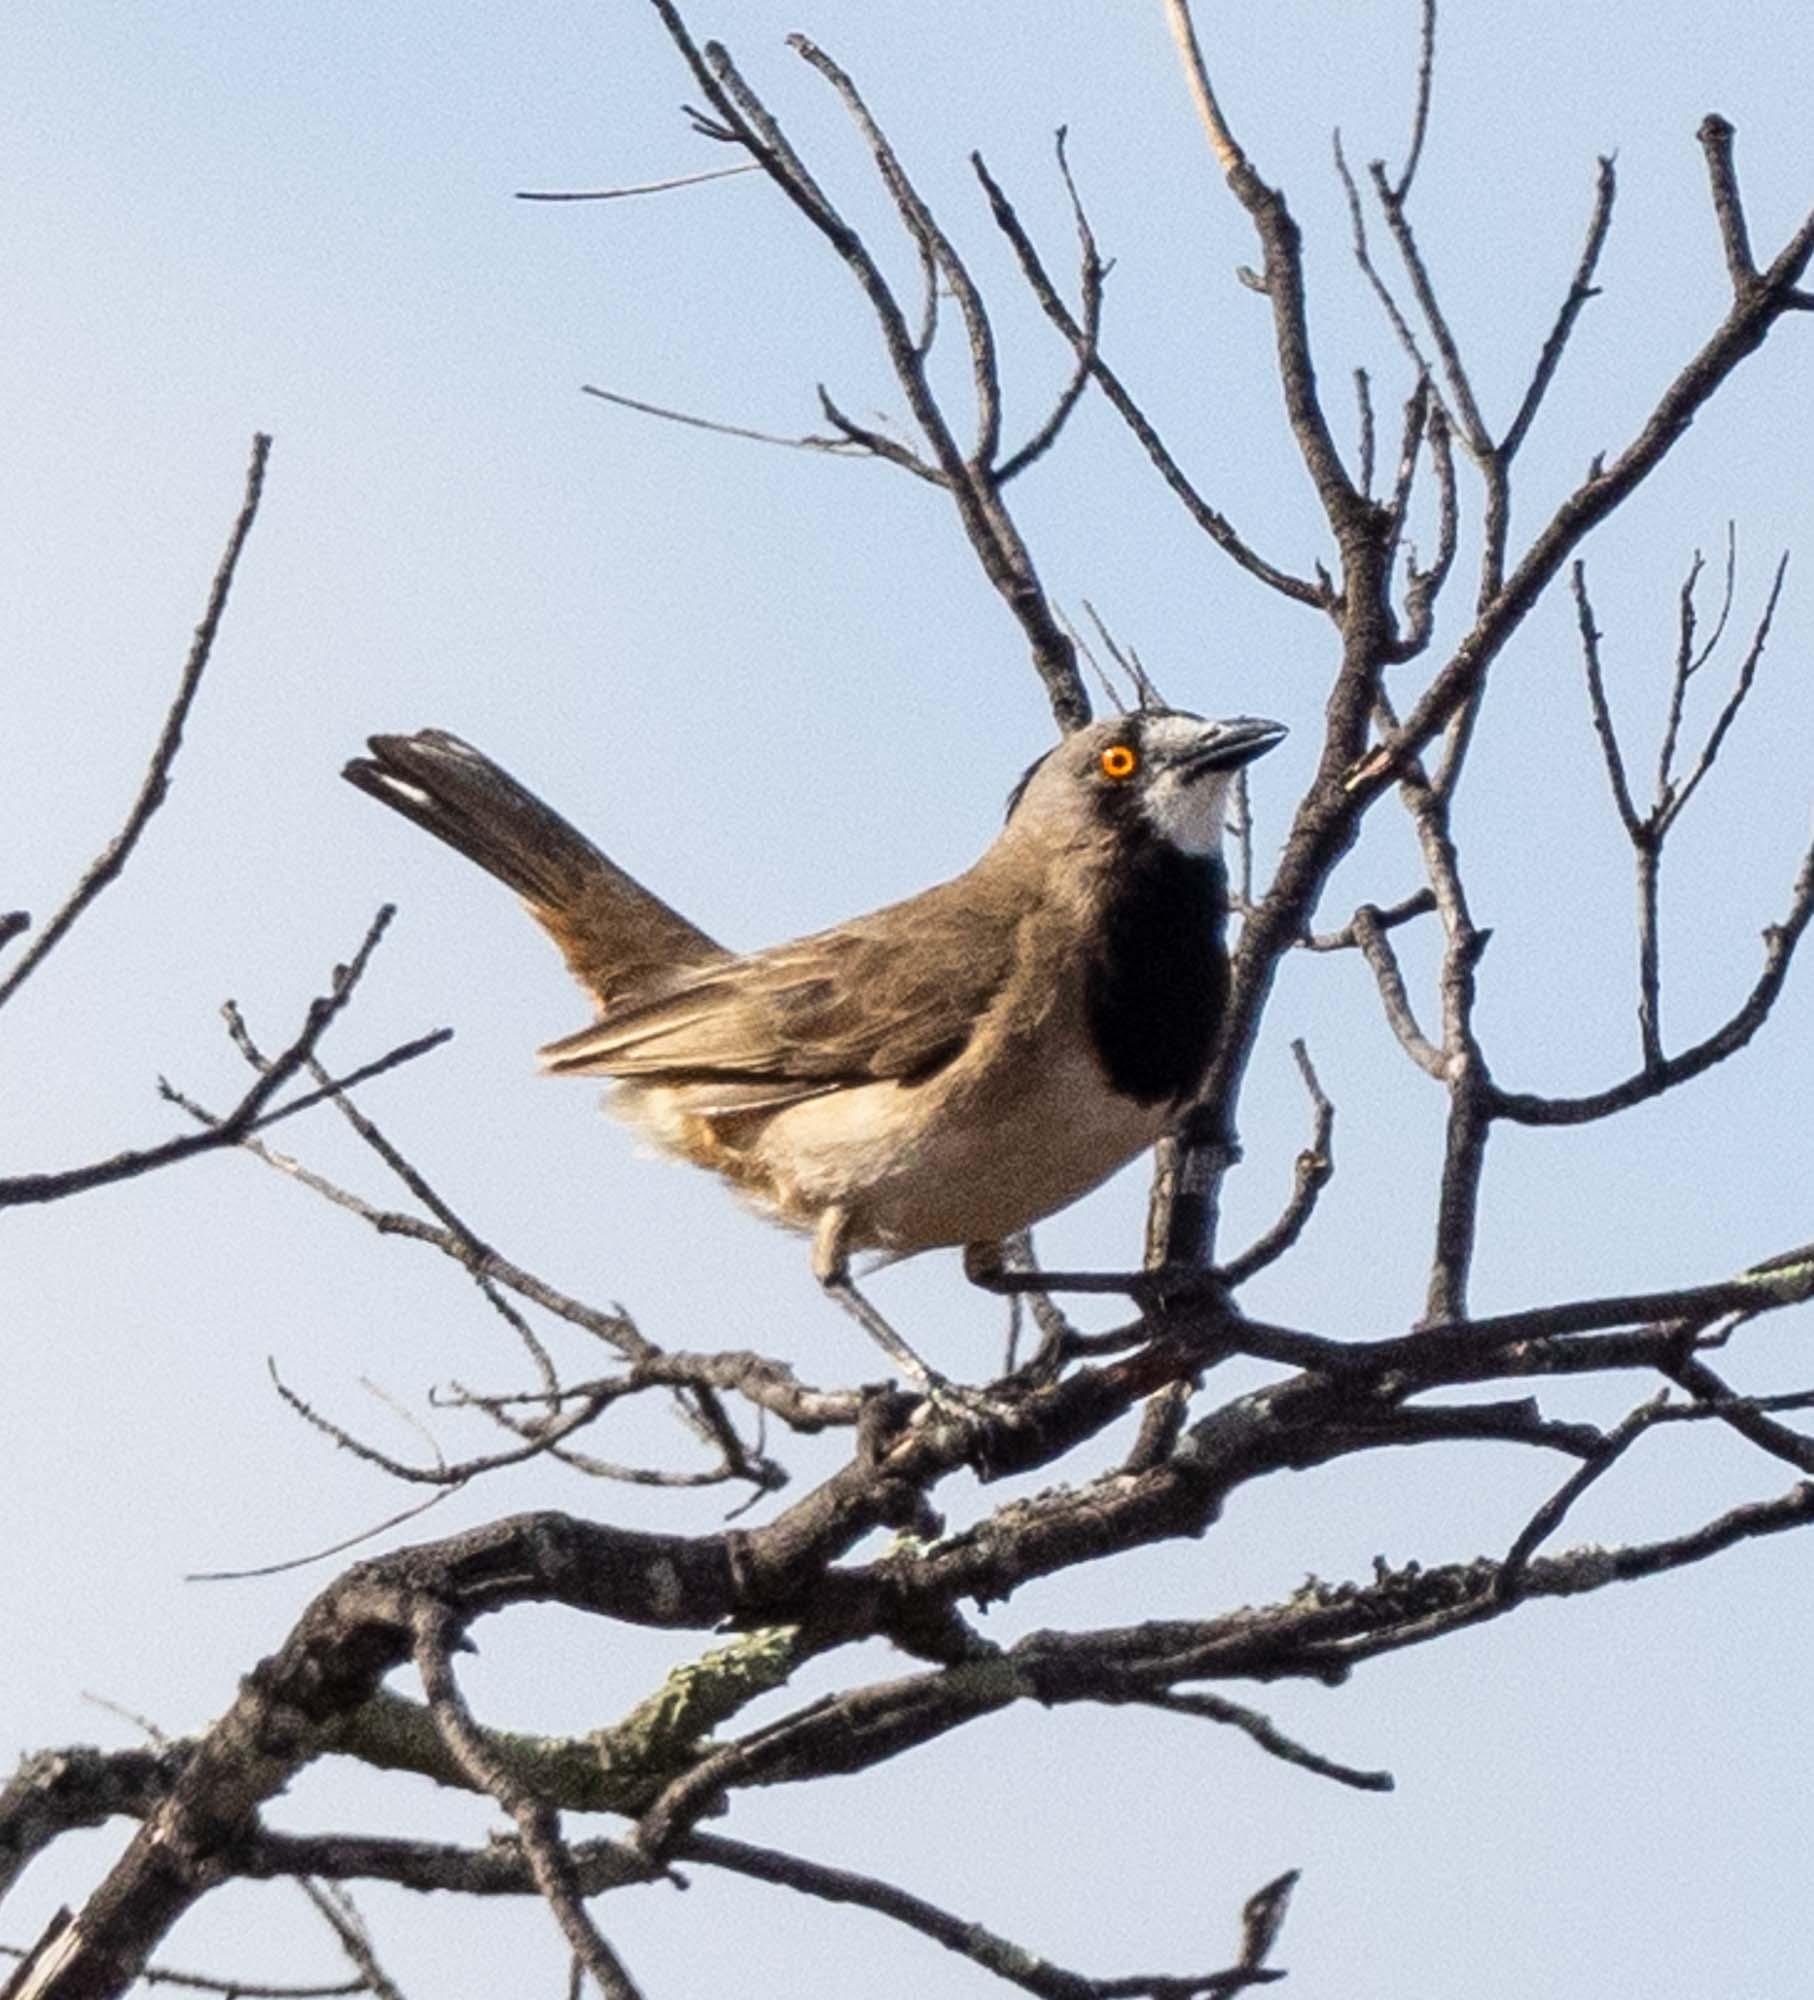 Crested Bellbird - male